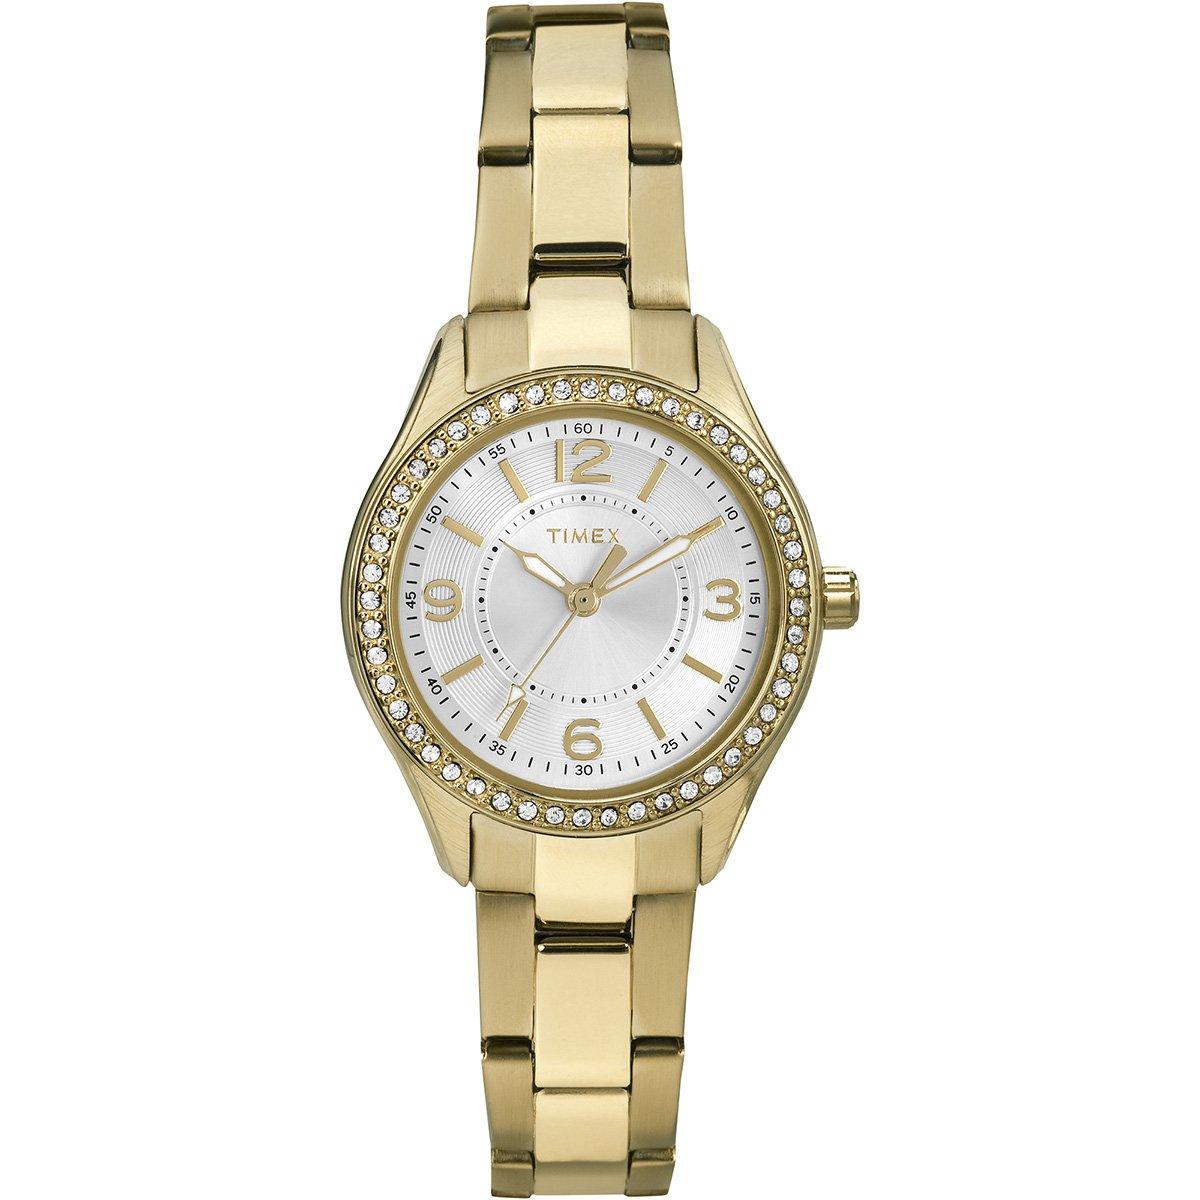 a079b4194d00 Reloj Dama Timex TW2P80100